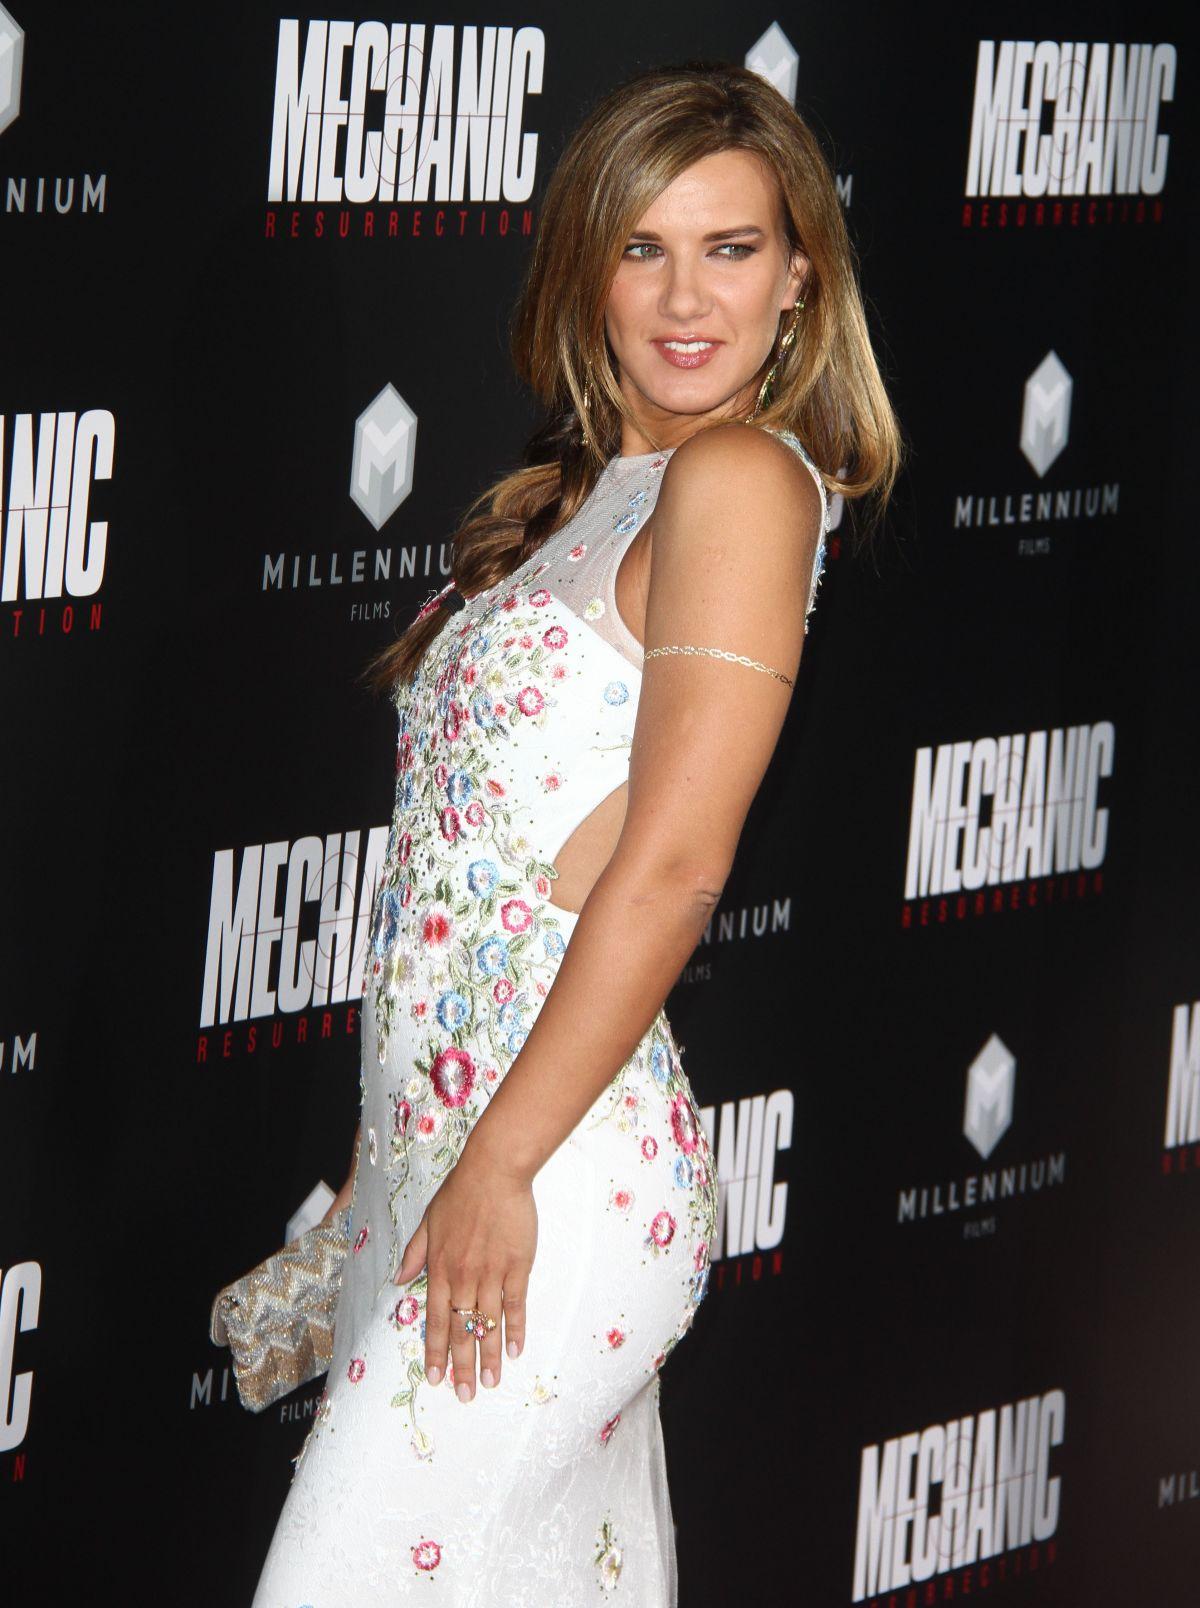 NATALIE BURN at 'Mechanic: Resurrection' Premiere in Hollywood 08/22/2016